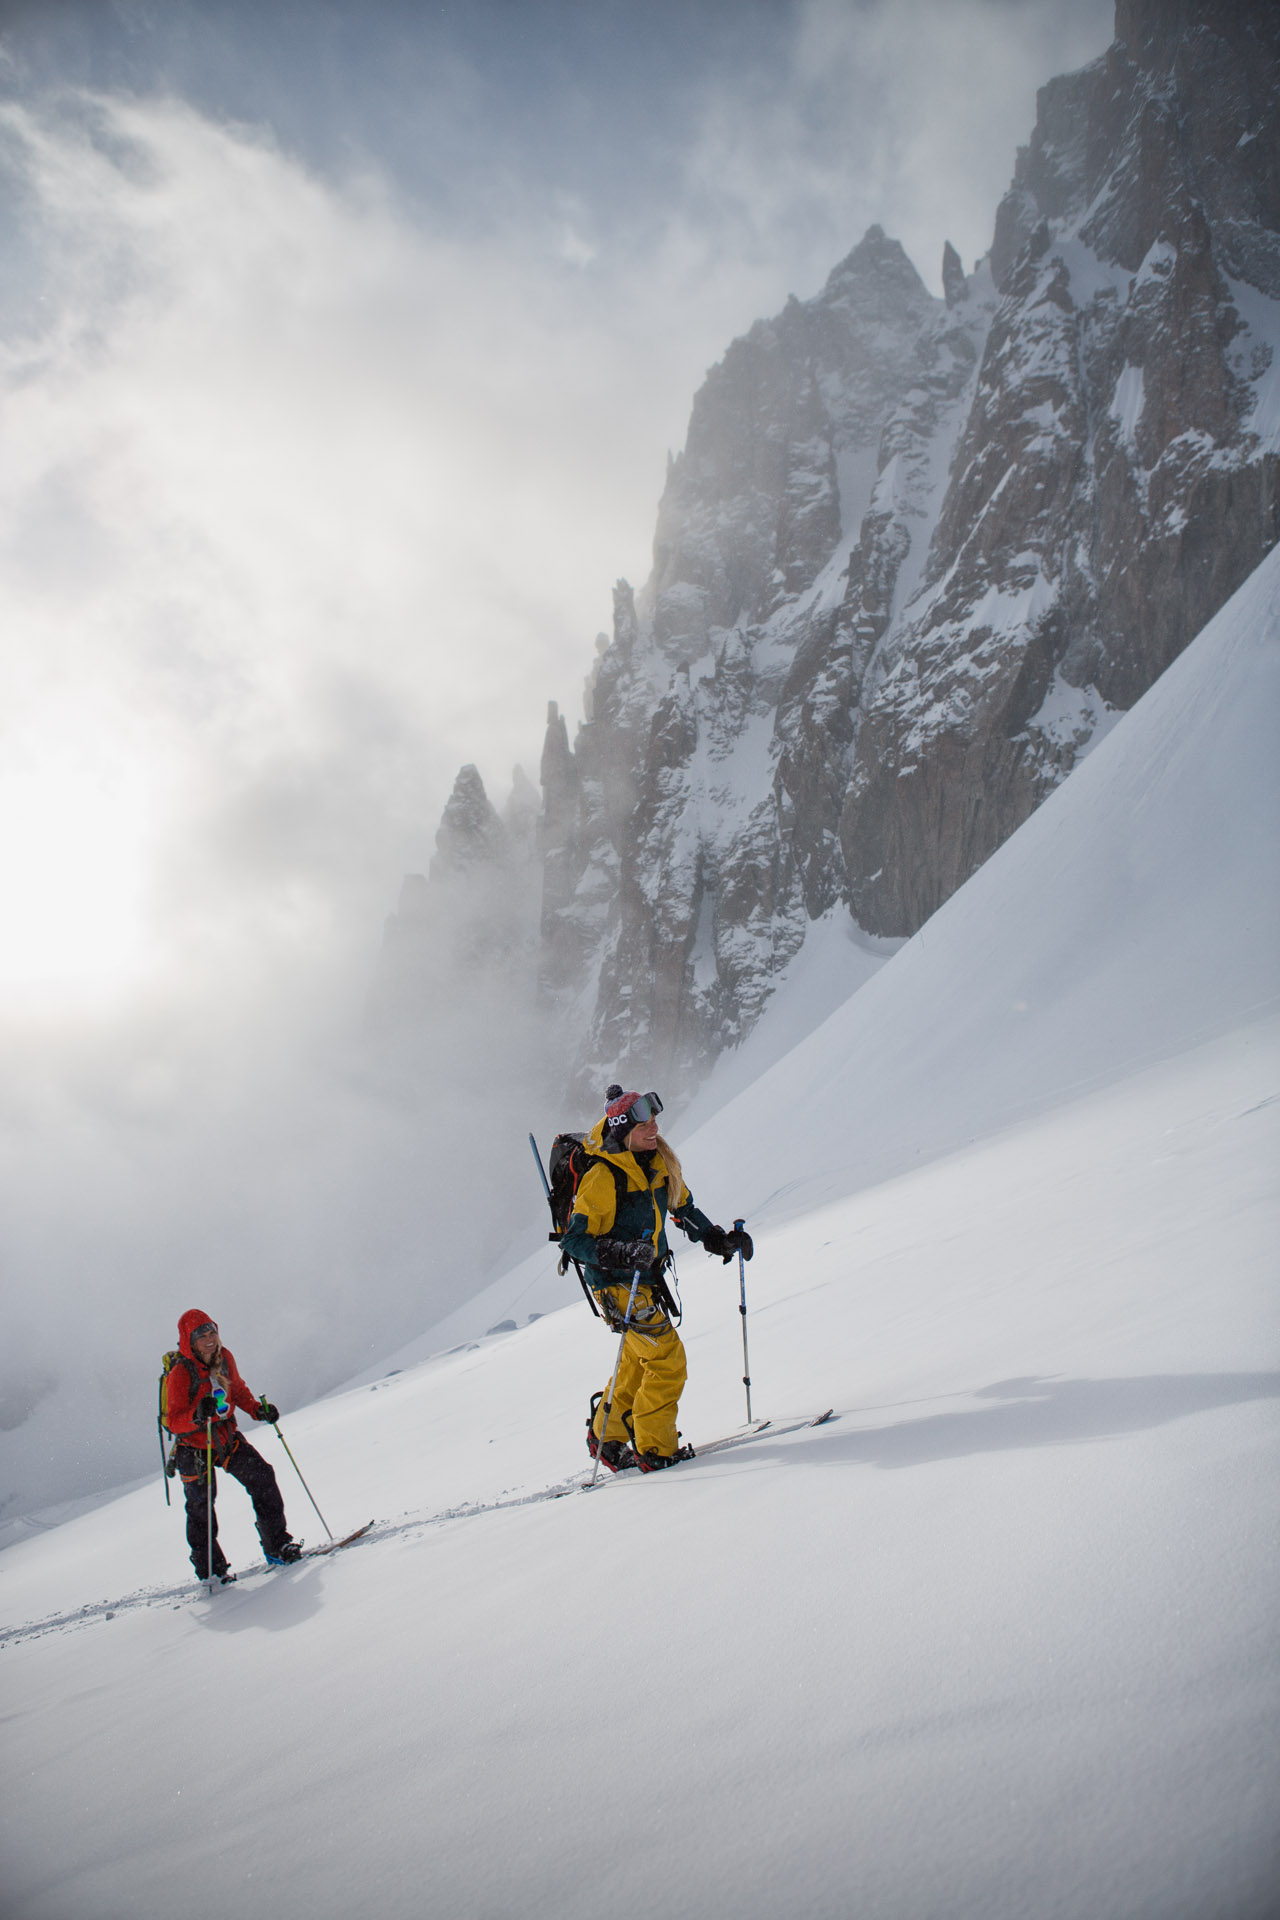 Bibi Pekarek and Liz Daley skin up Glacier des Améthystes